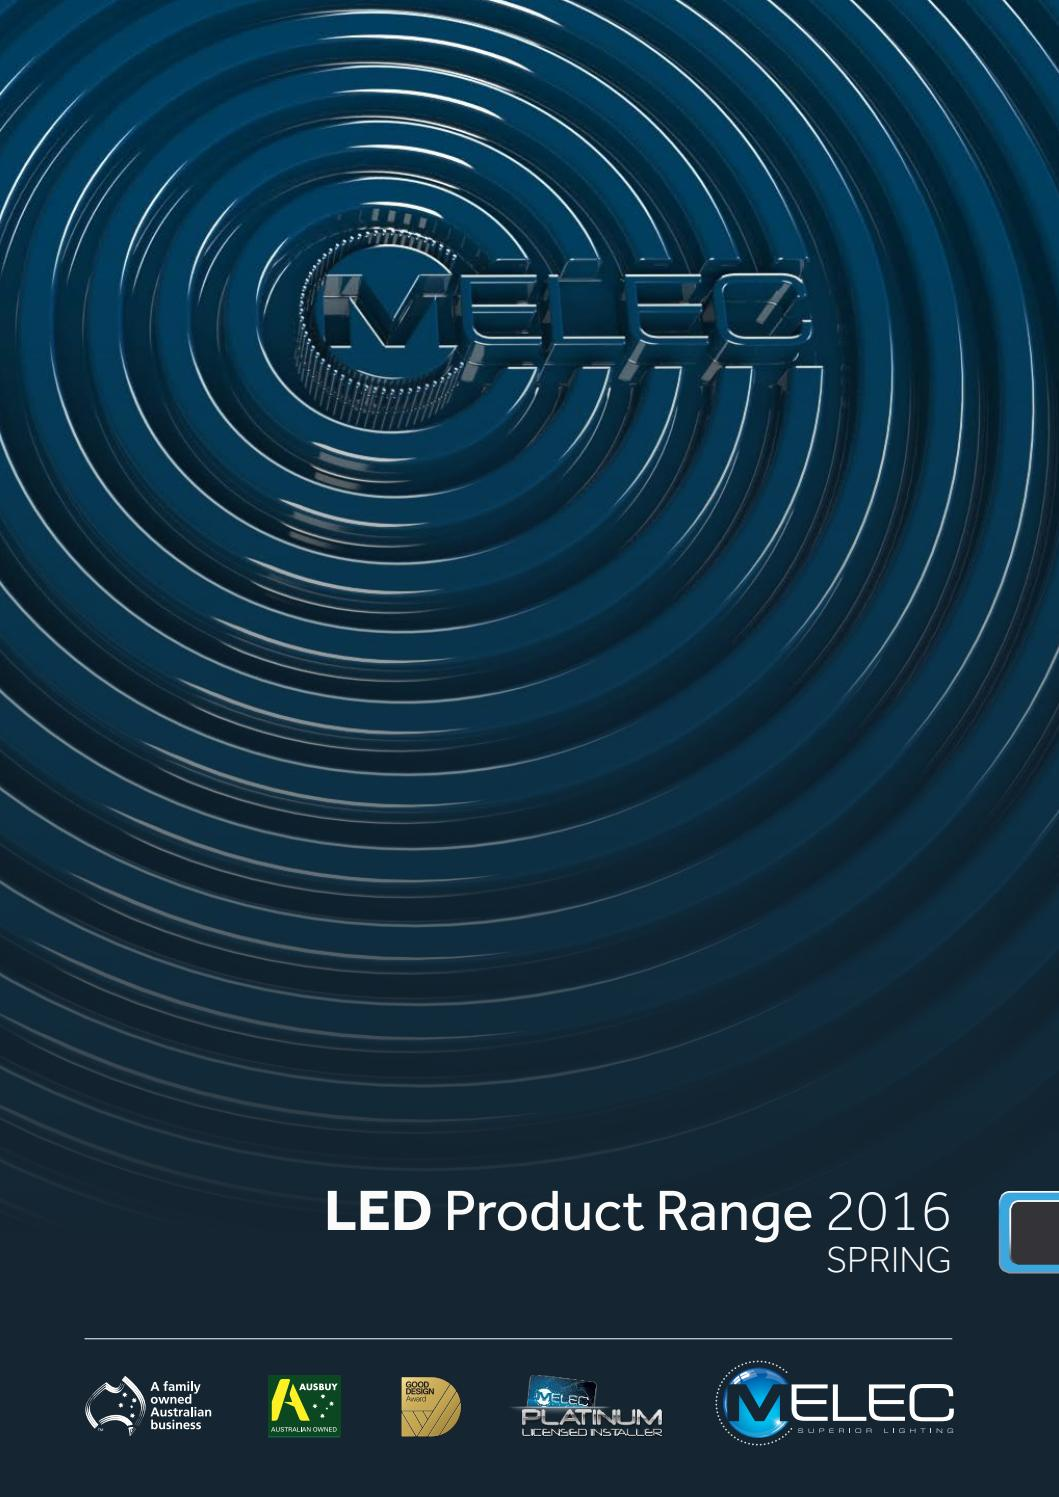 3000K 500lm LED Spot Light Bulbs,Pack Of 10 units 50W Halogen Lamp Equivalent Warm White 60Beam Angle CY LED 6W MR16 LED Lamps